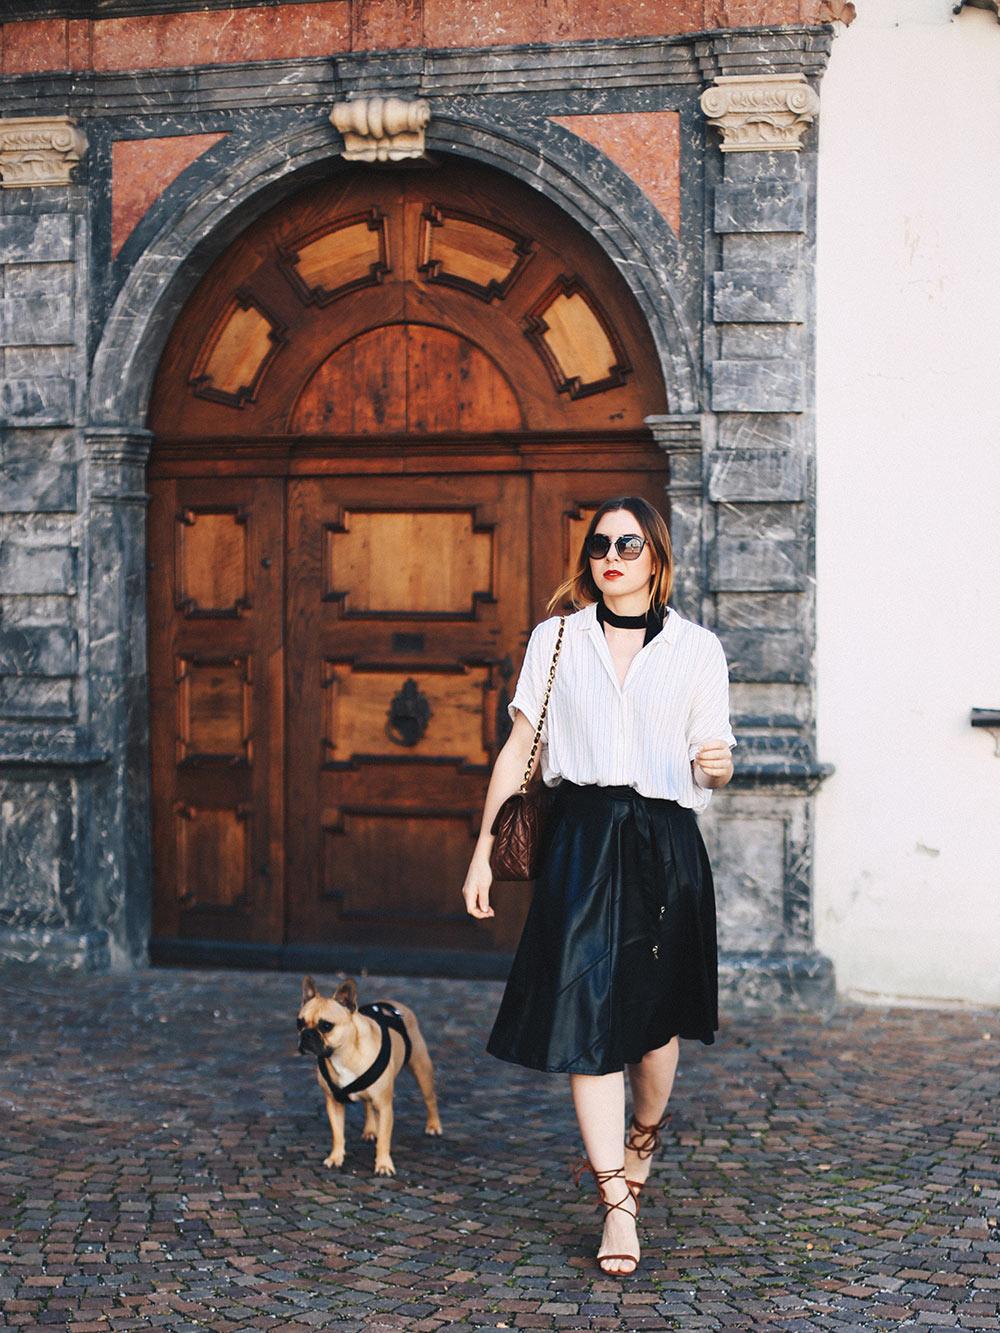 Wardrobe-Essential-schwarzer-Midirock-aus-Leder-Patrizia-Pepe-outfit-streetstyle-fashionblog-modeblog-whoismocca-7